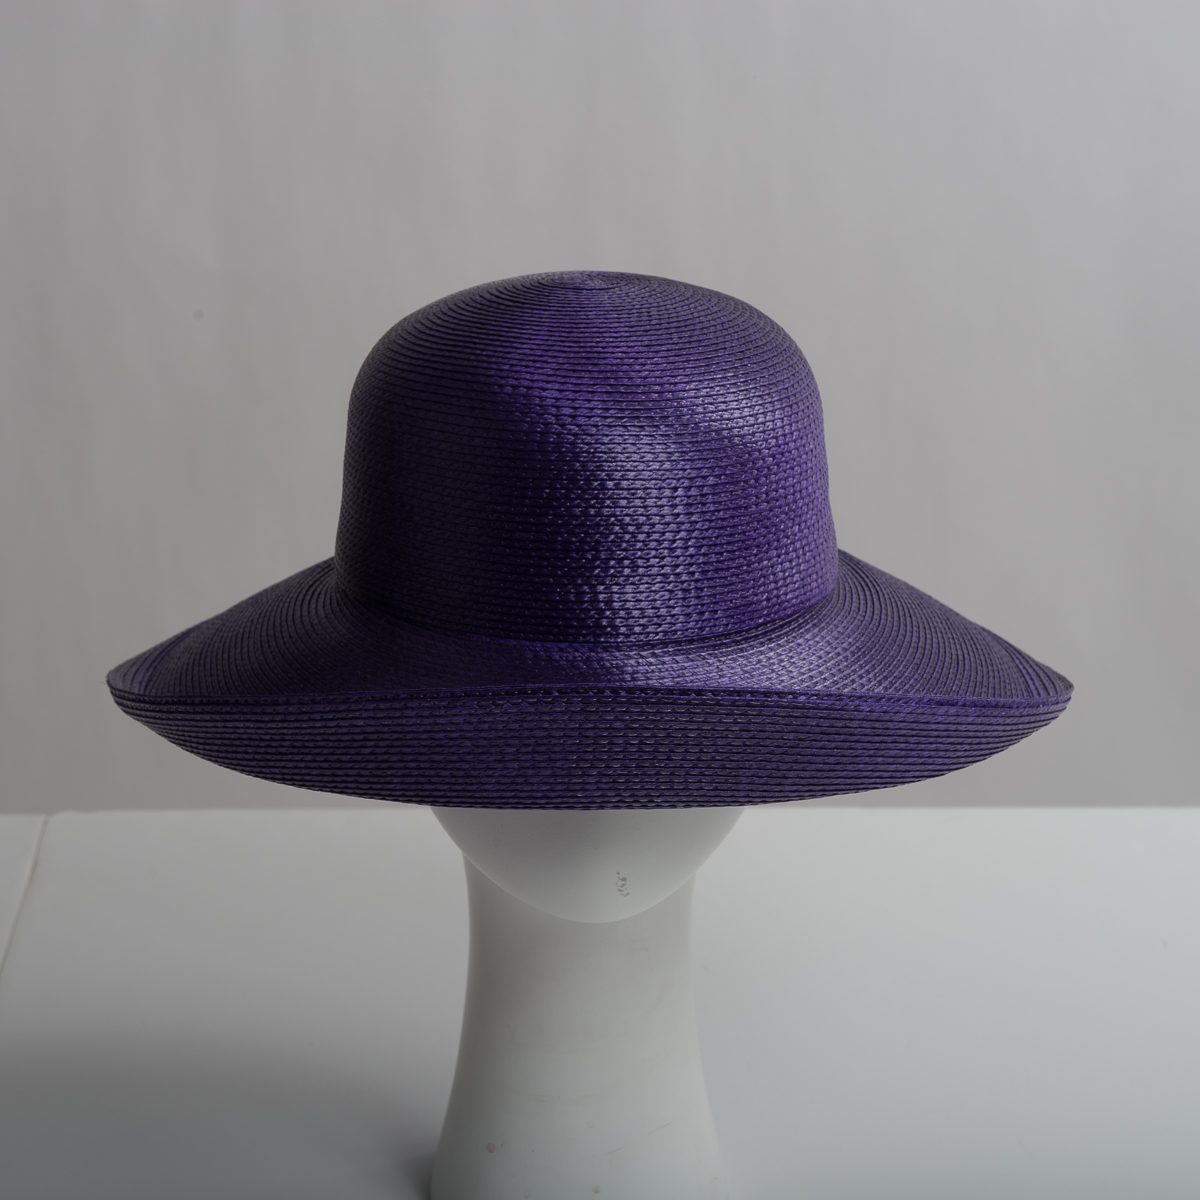 26692be1138b39 Purple Polypropylene Straw Medium Brim Plain Hats-CK01R-0-39- Sun Yorkos |  Zoria